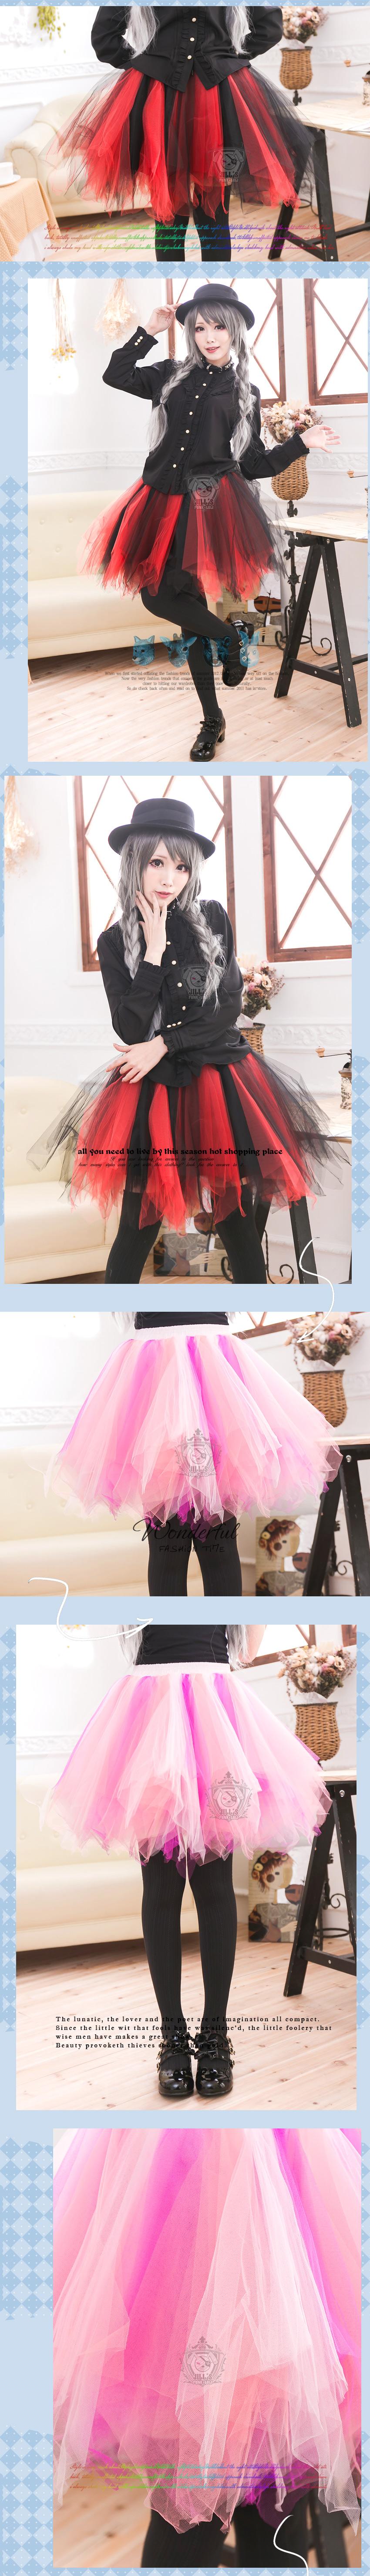 lolita cosplay Phantasy wedding peach multi strand puffy petticoat skirt J2W3002